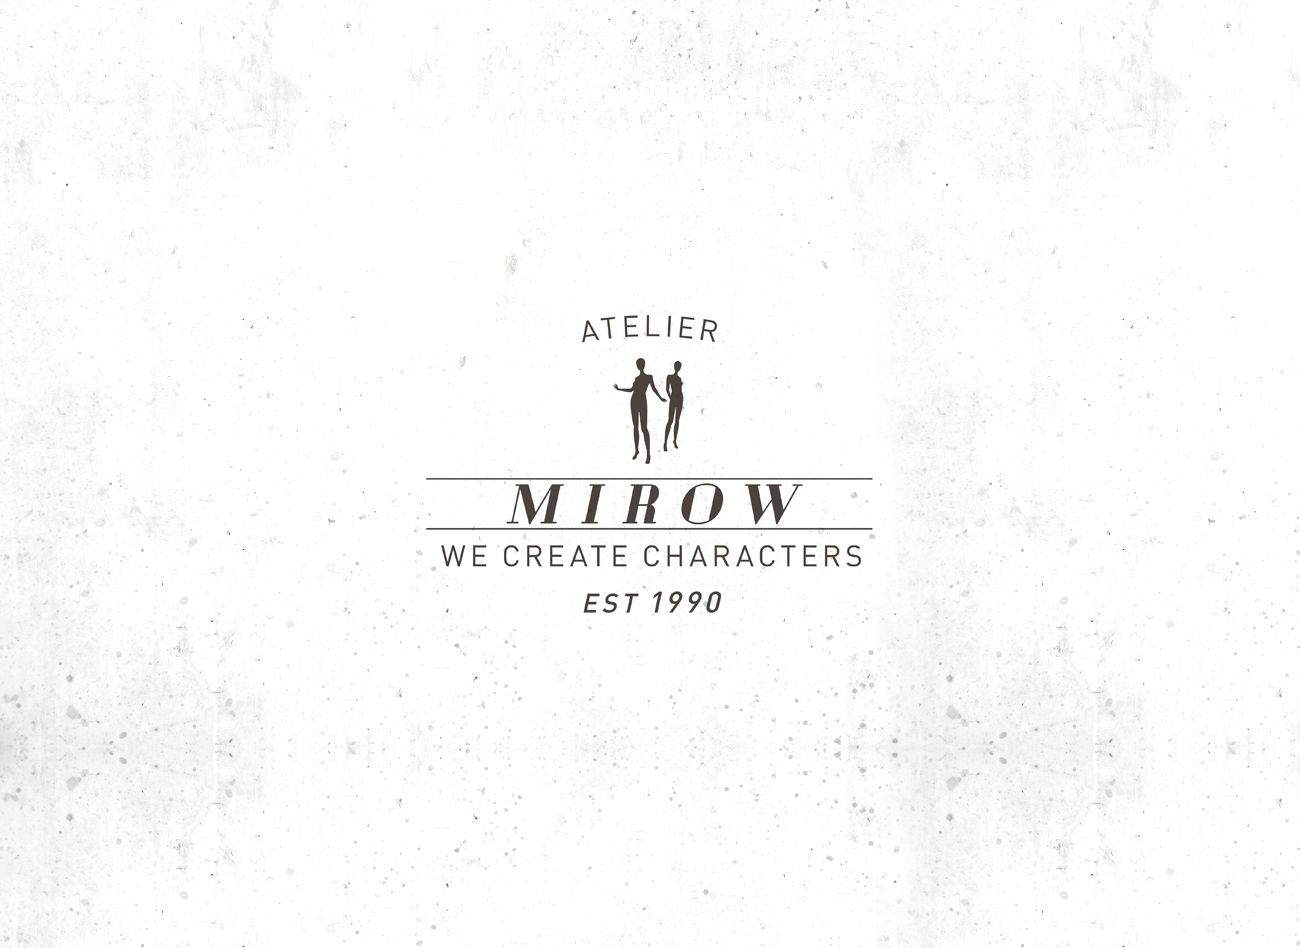 Logogestaltung / Atelier MIROW